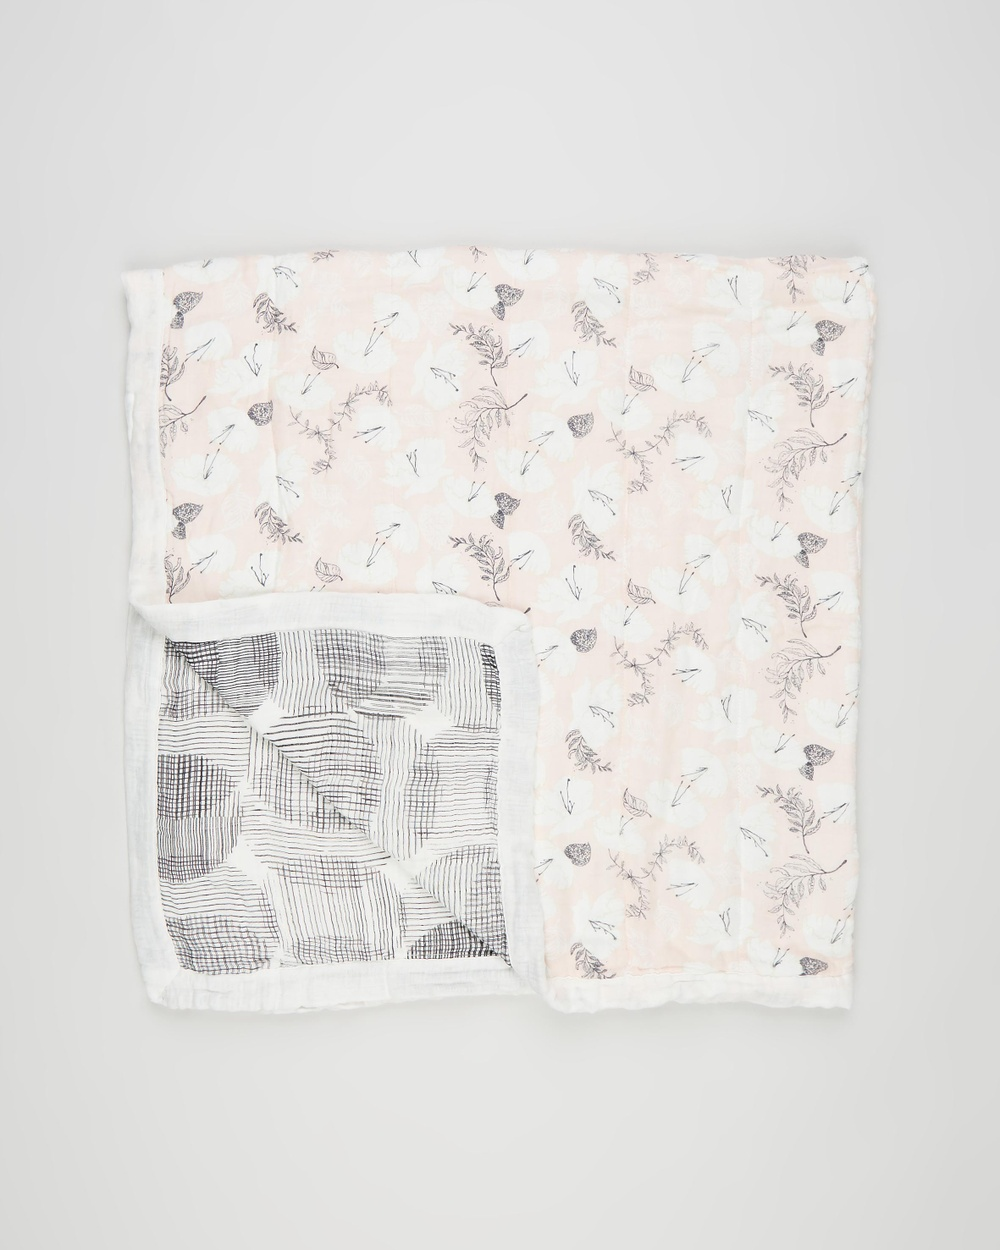 Aden & Anais Soft Petals Silky Dream Blanket Babies Blankets Pretty Petals